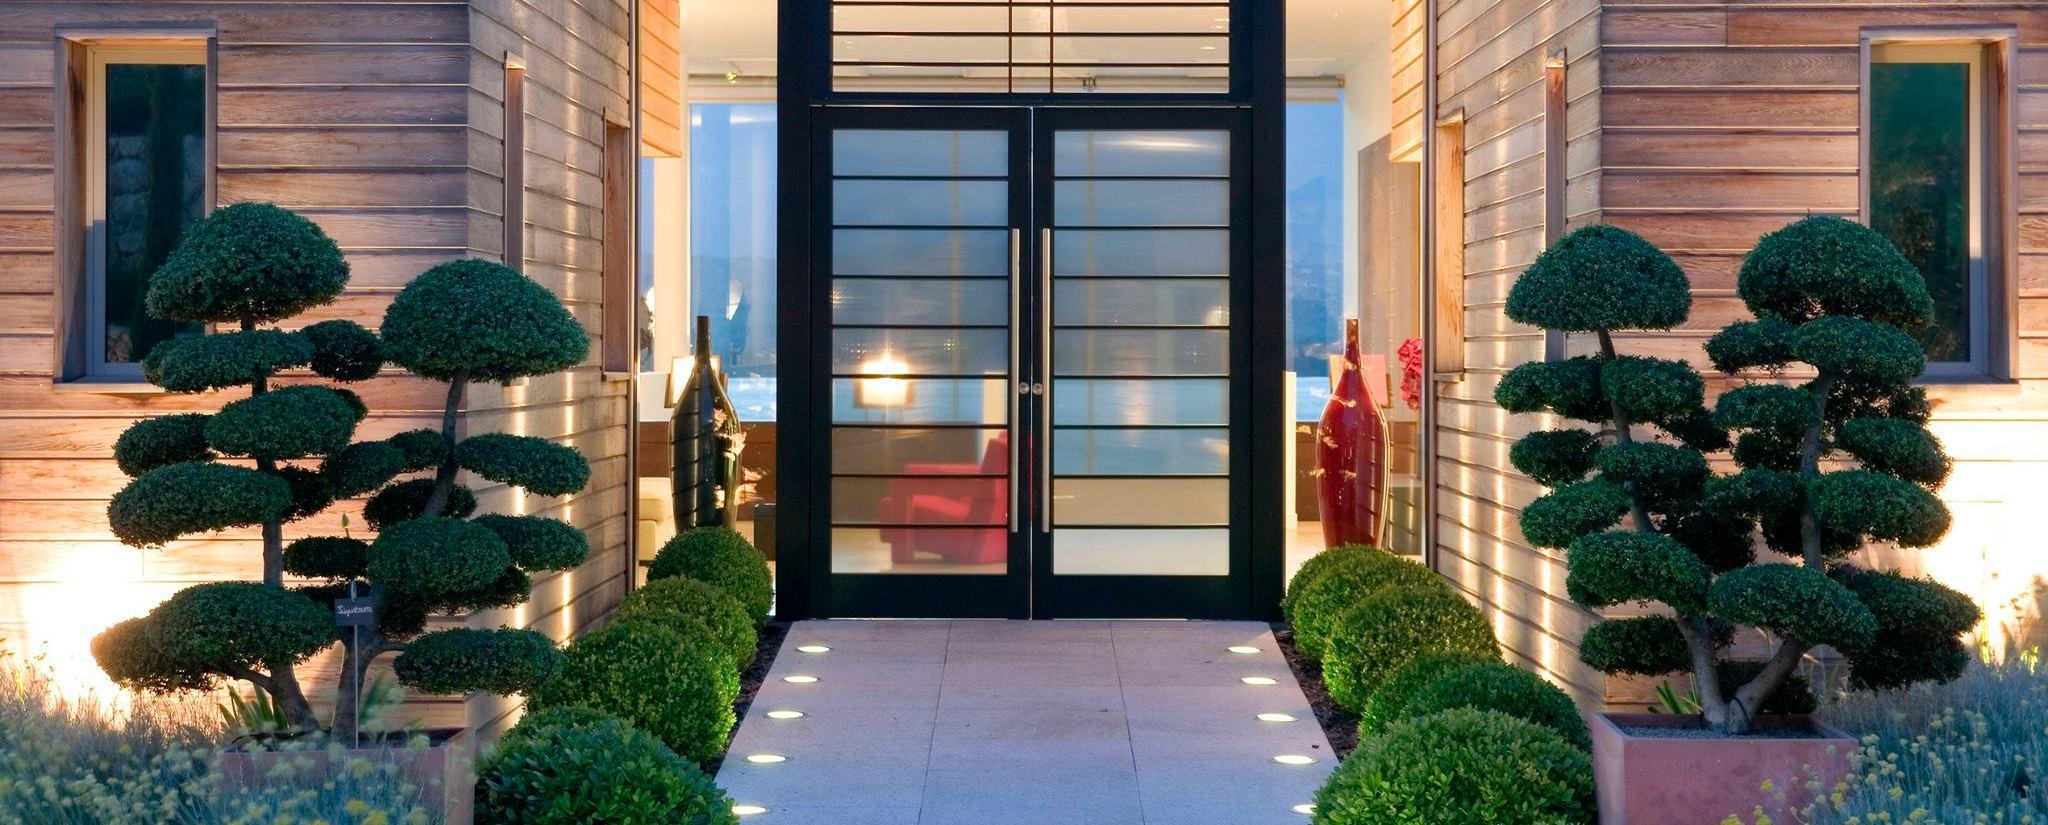 hotel-casadelmar-corsica-entrance